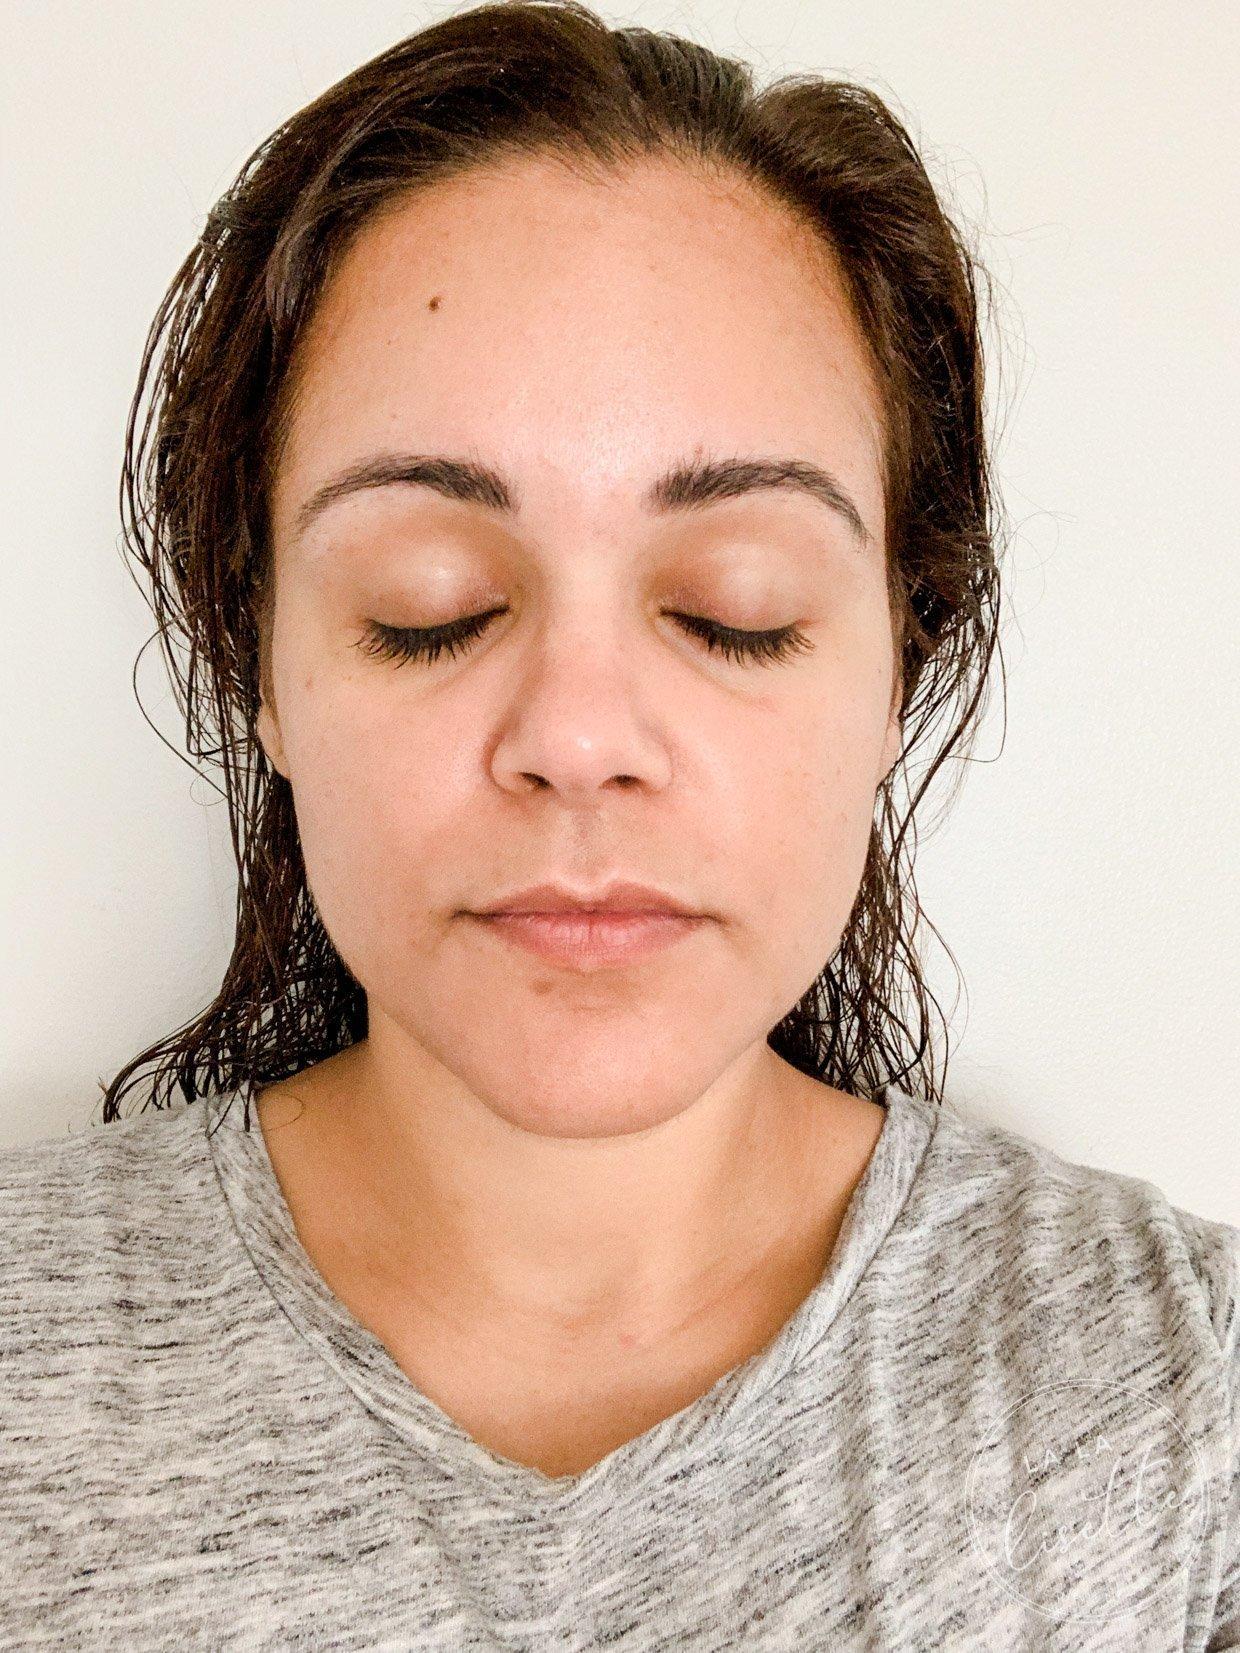 skin before Beautycounter Countertime